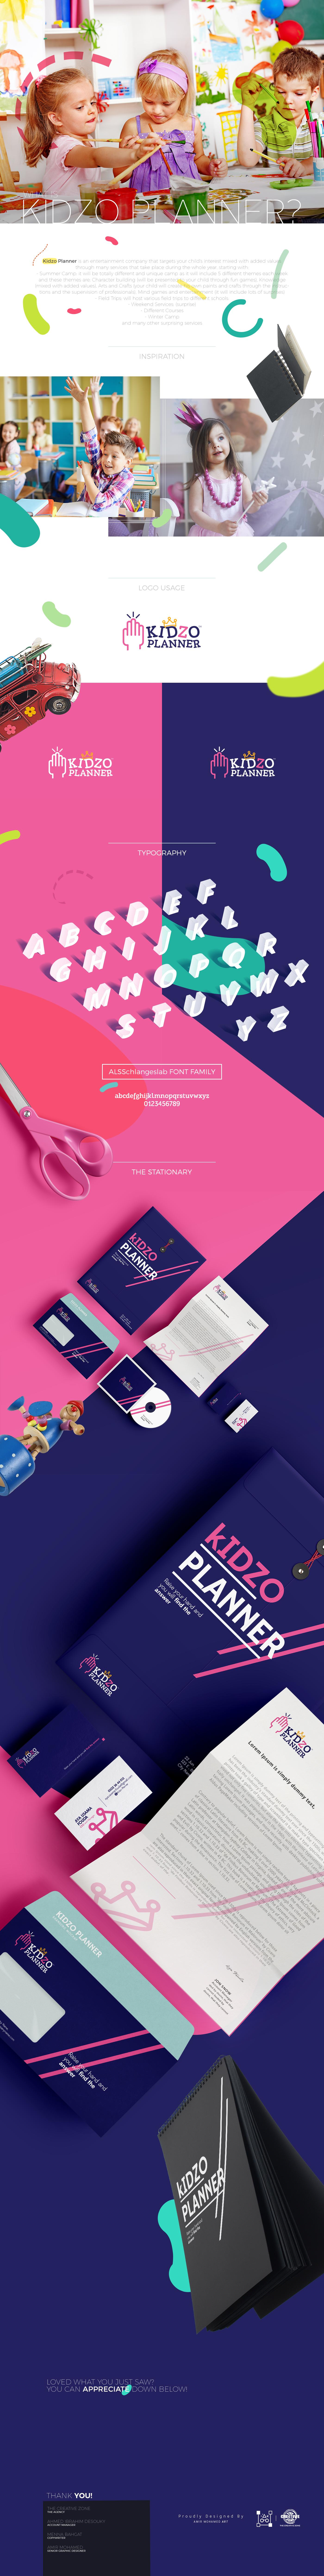 kidzo planner logo design art children childish school activity identity visual